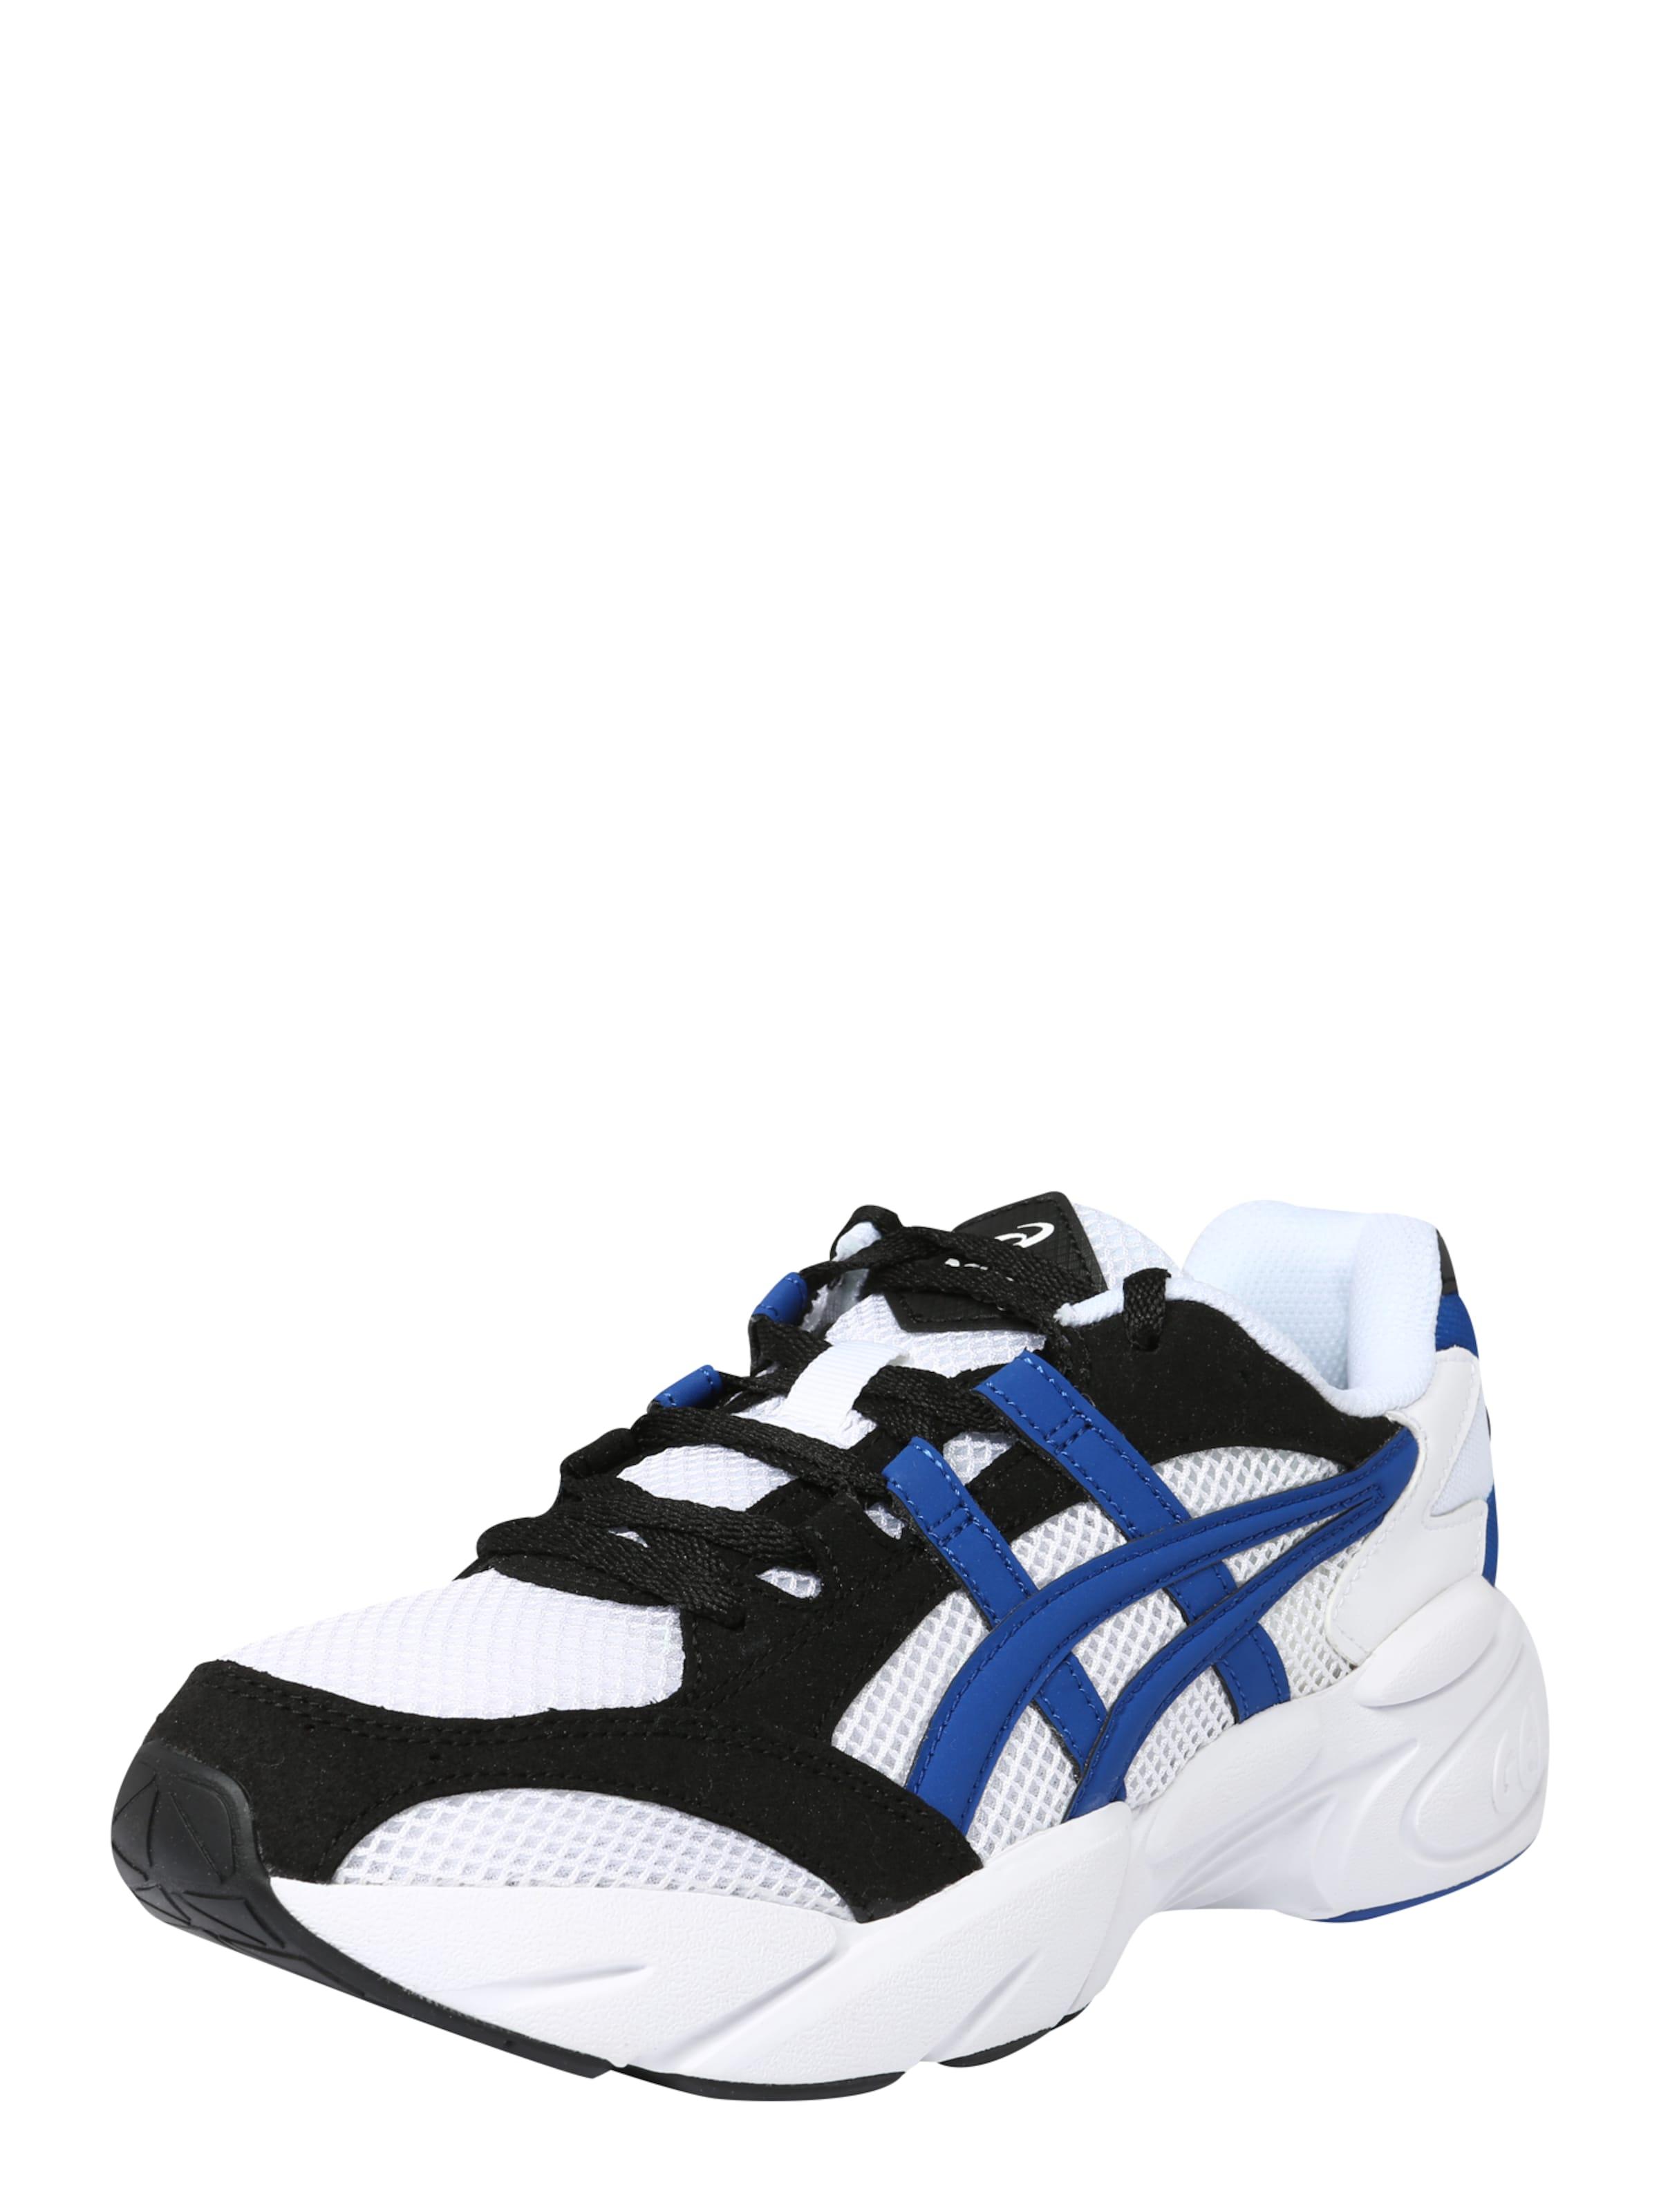 Basses Baskets Blanc 'gel FoncéNoir Bleu Asics Tiger En bondi' LzVSMpGqU